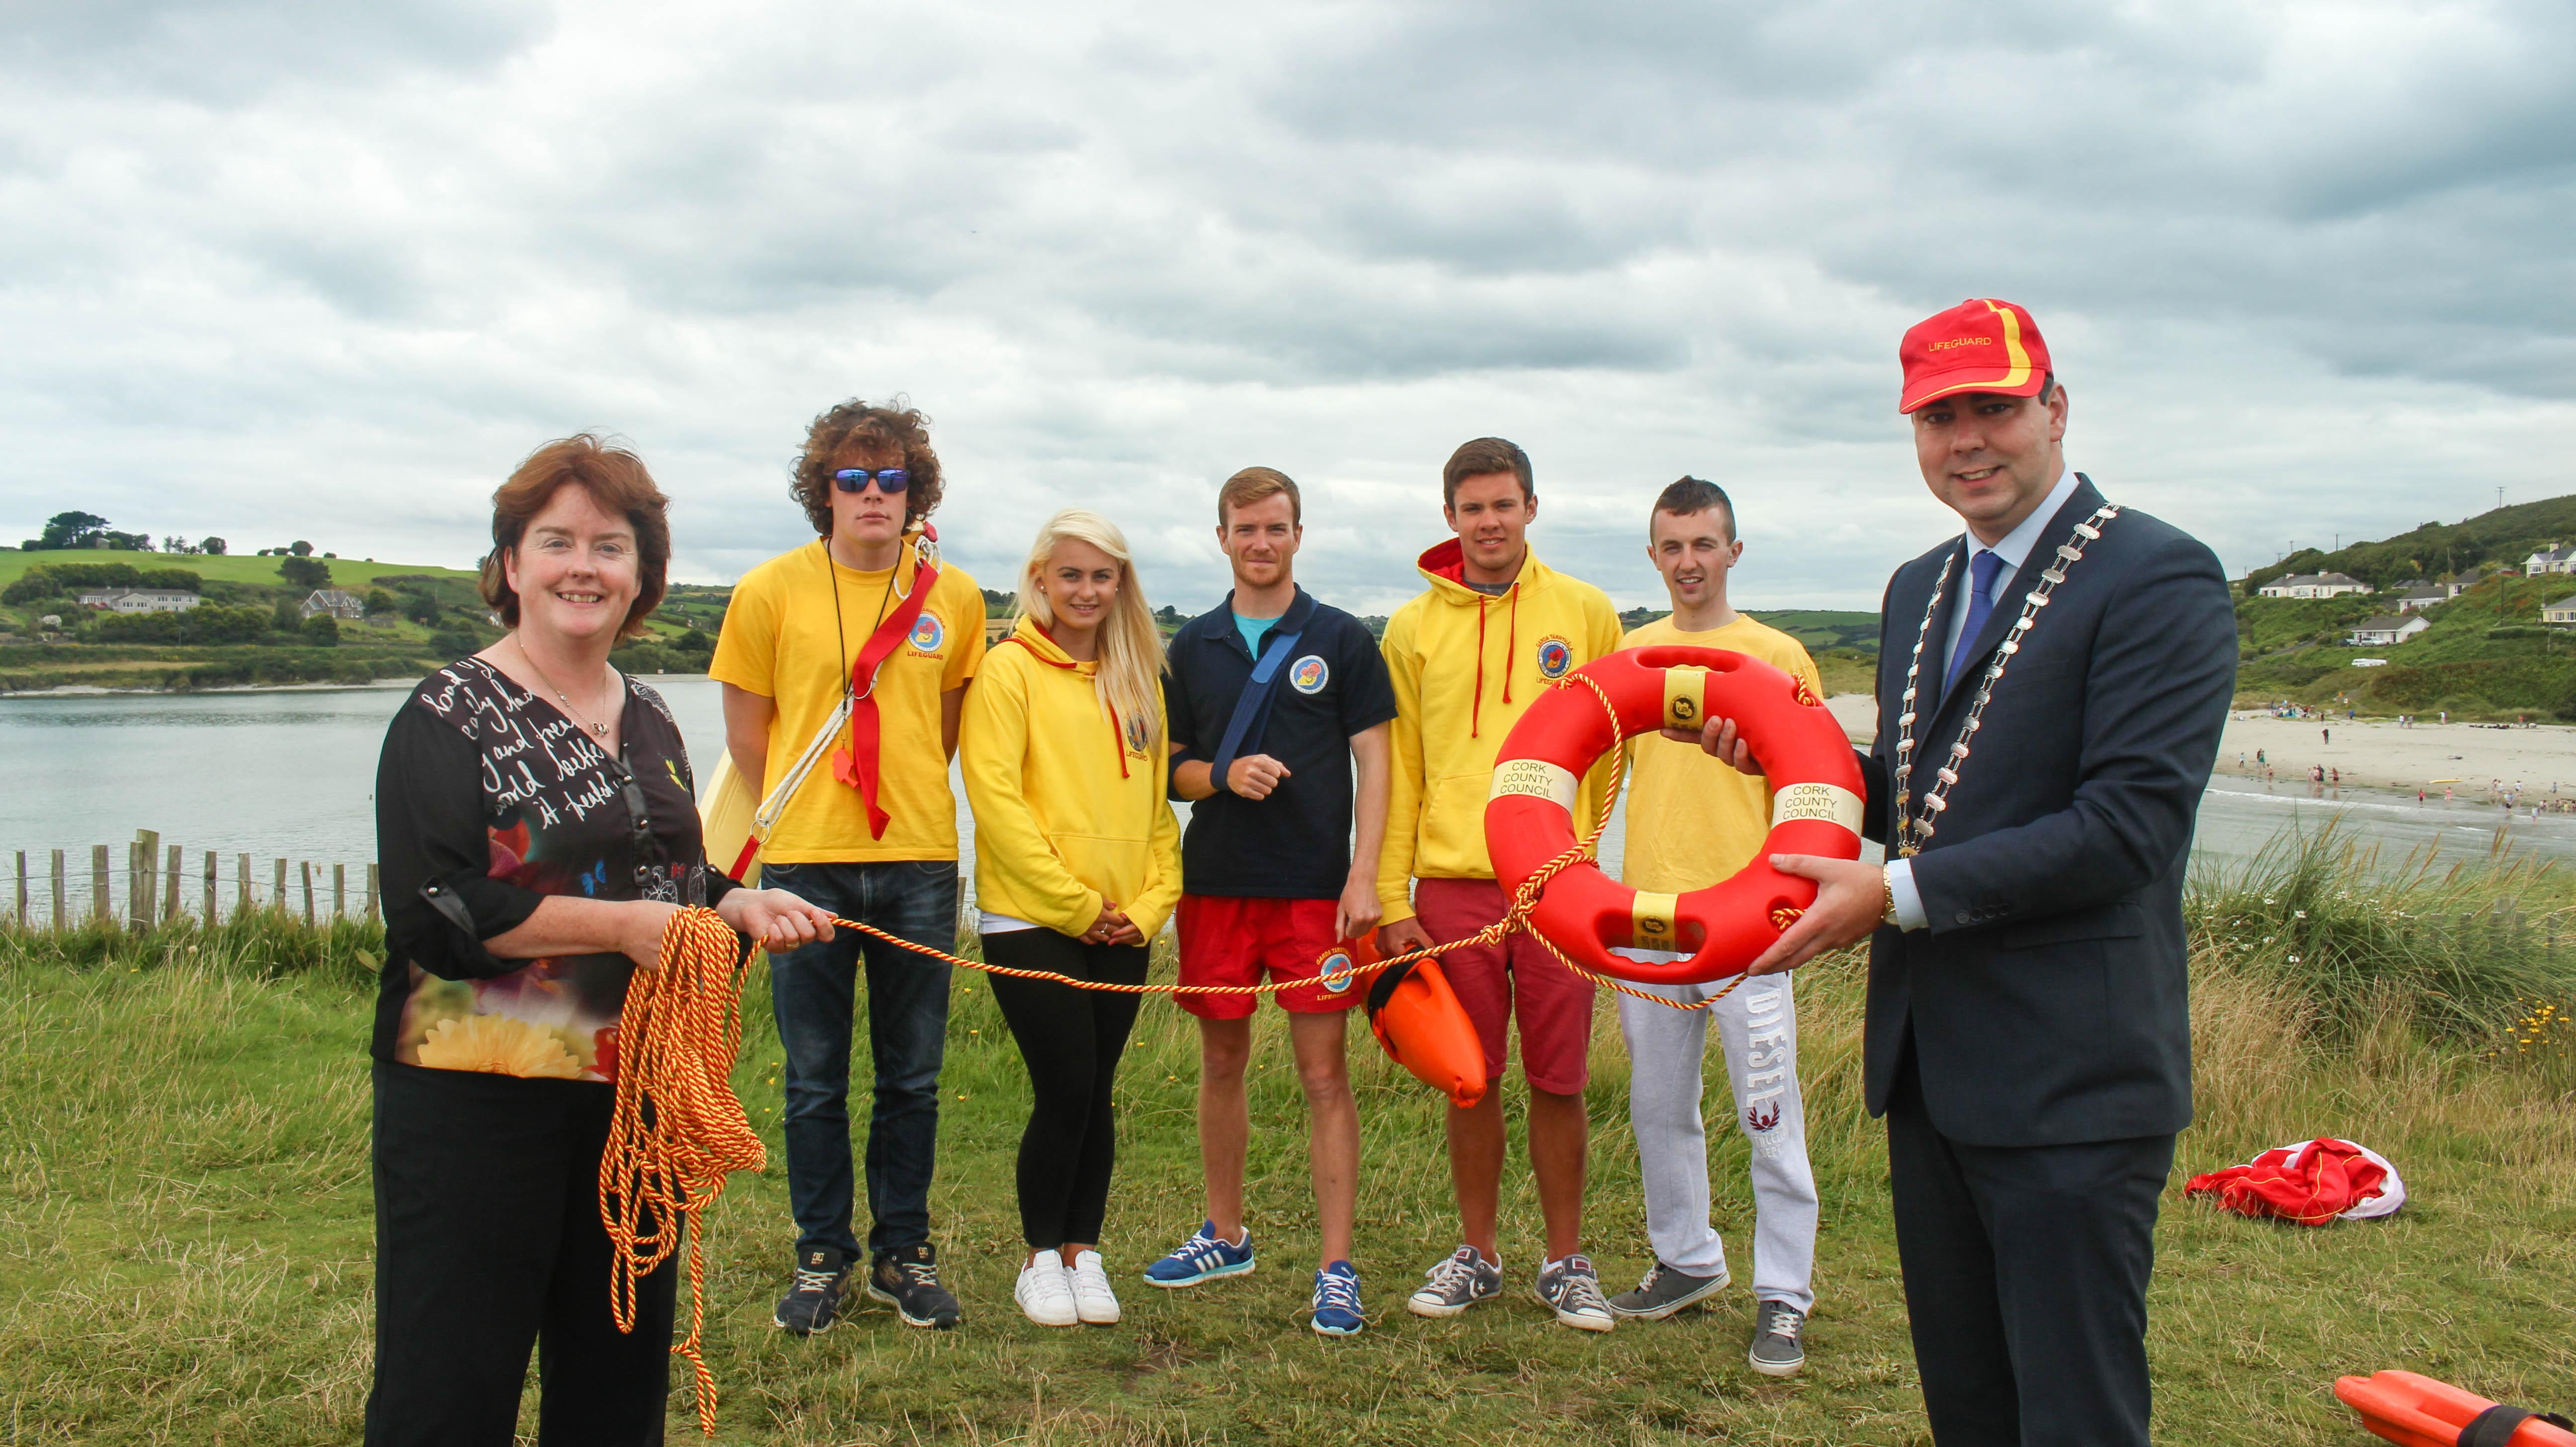 Beach Lifeguards Commence Patrolling Cork Beaches